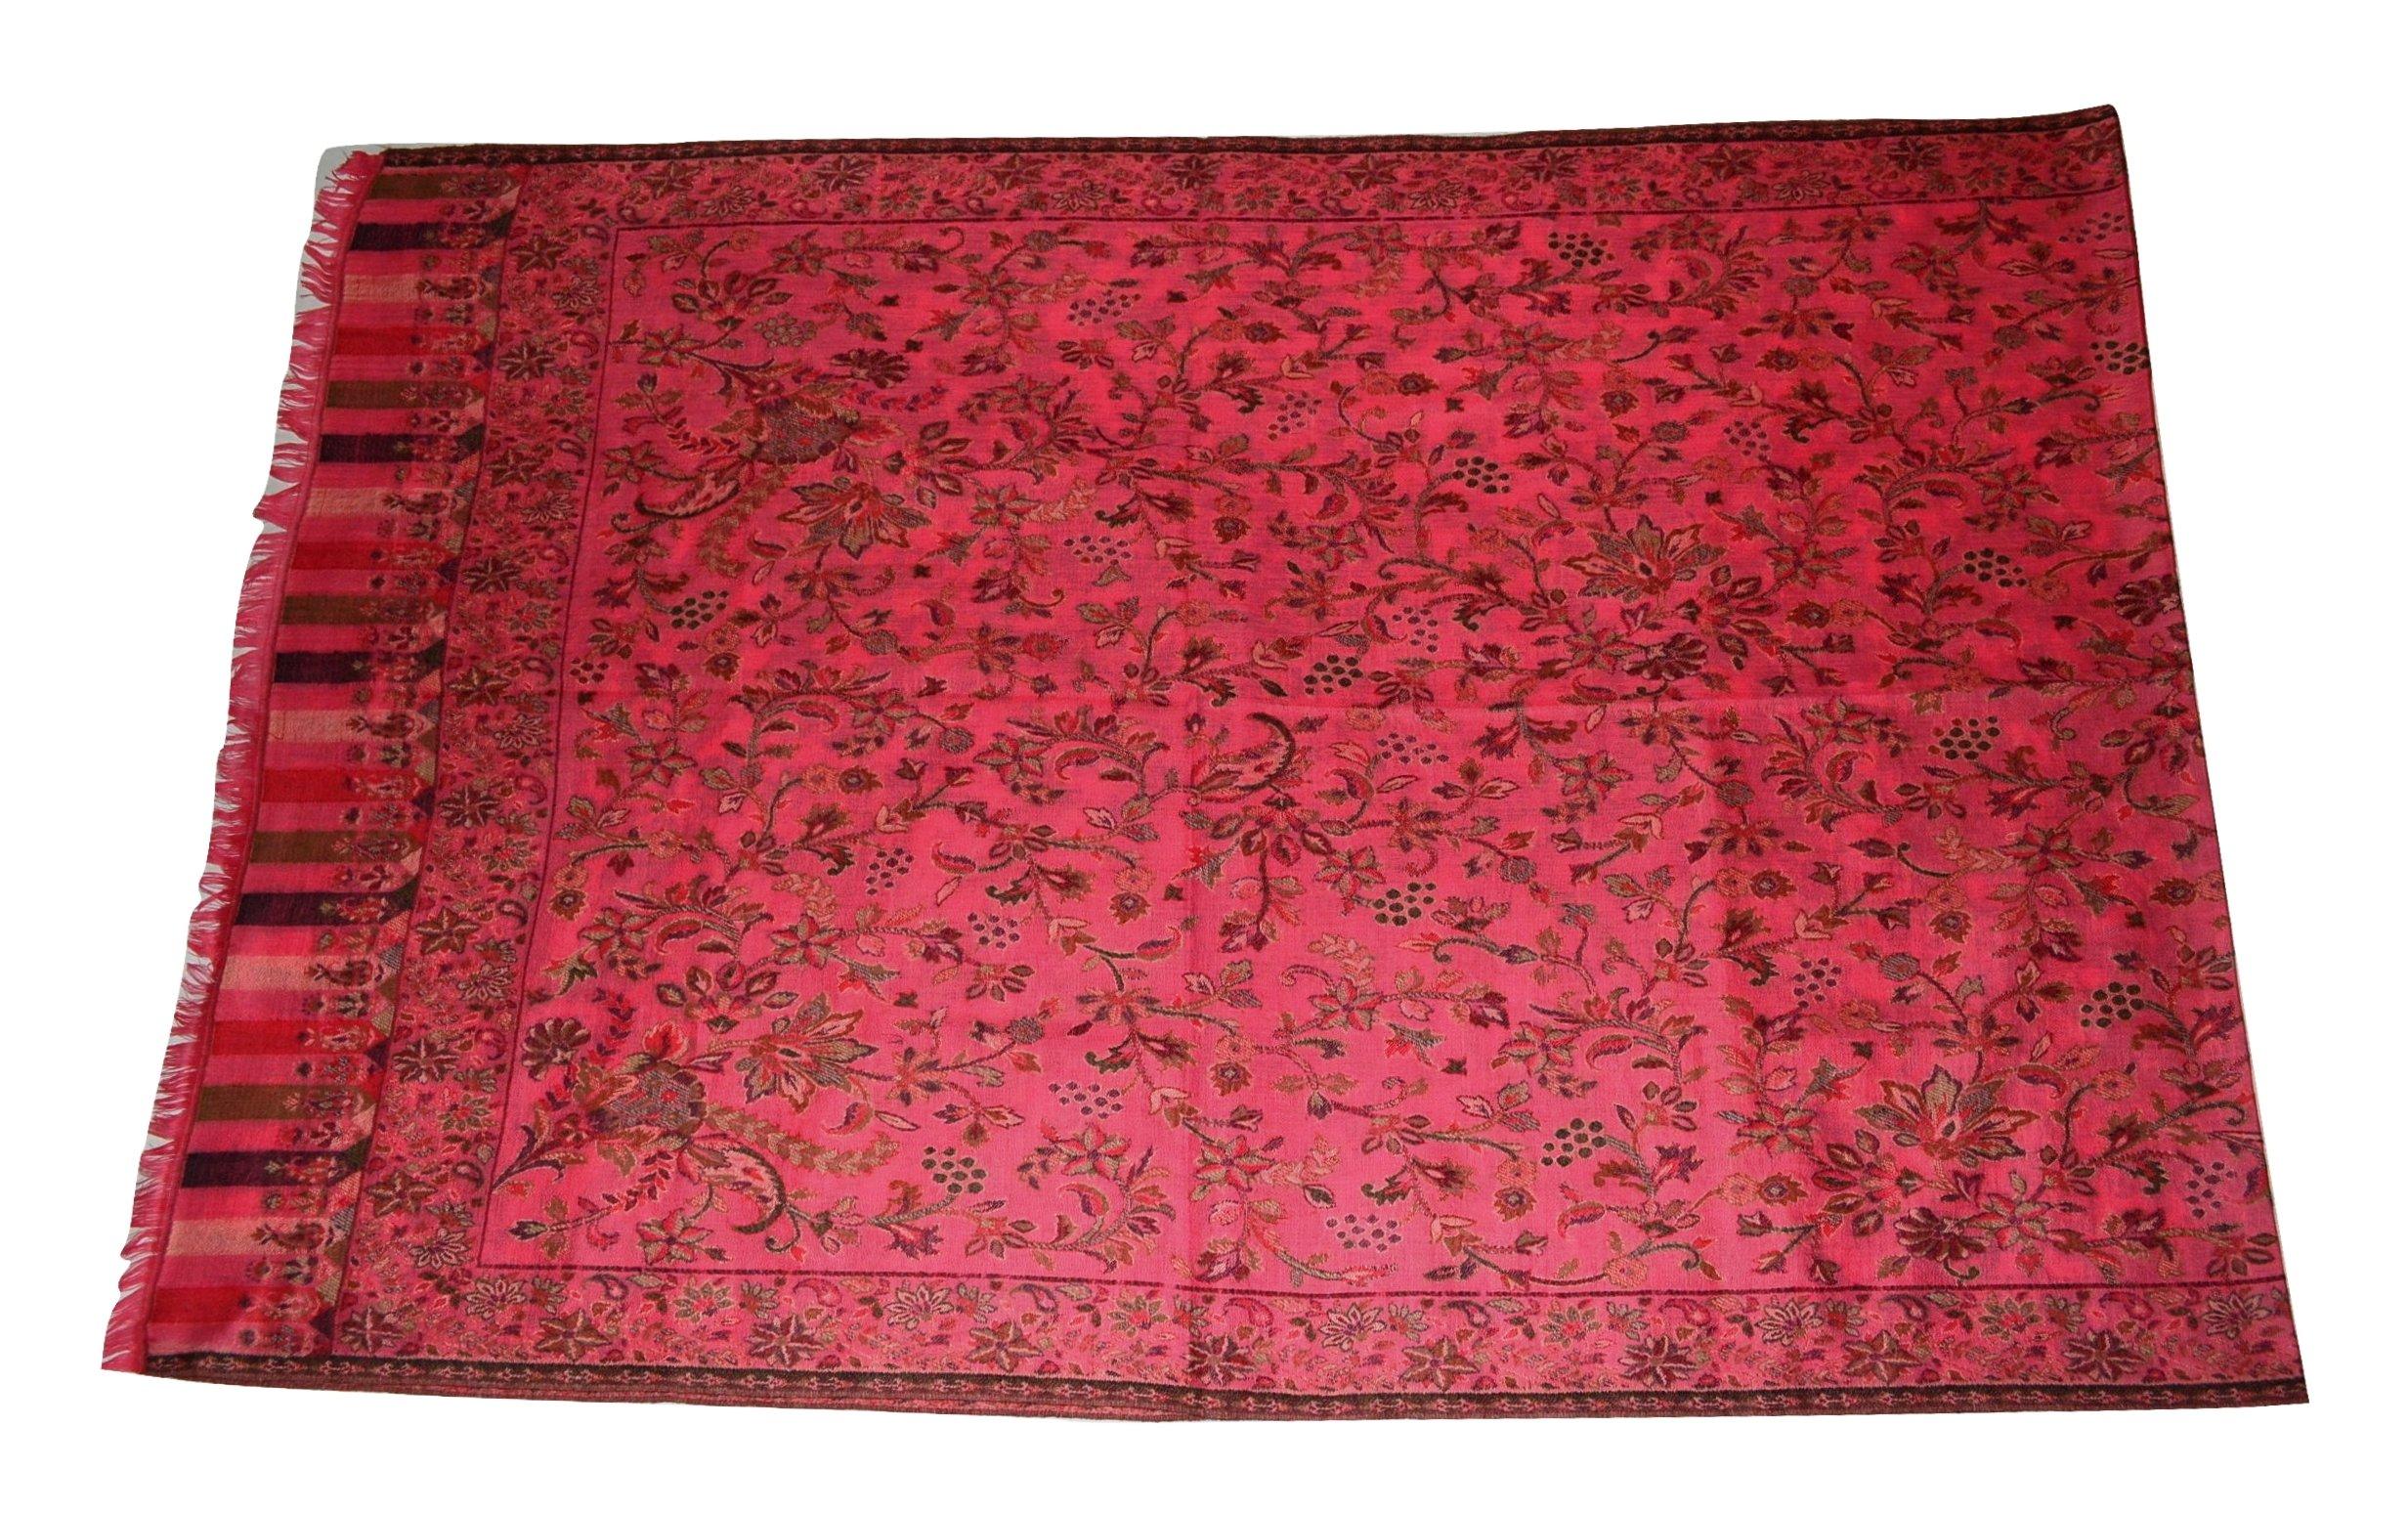 Handmade Pashmina & Fine Wool Fabric Multicolor Floral Paisley KANI Scarf/Stole.X1838